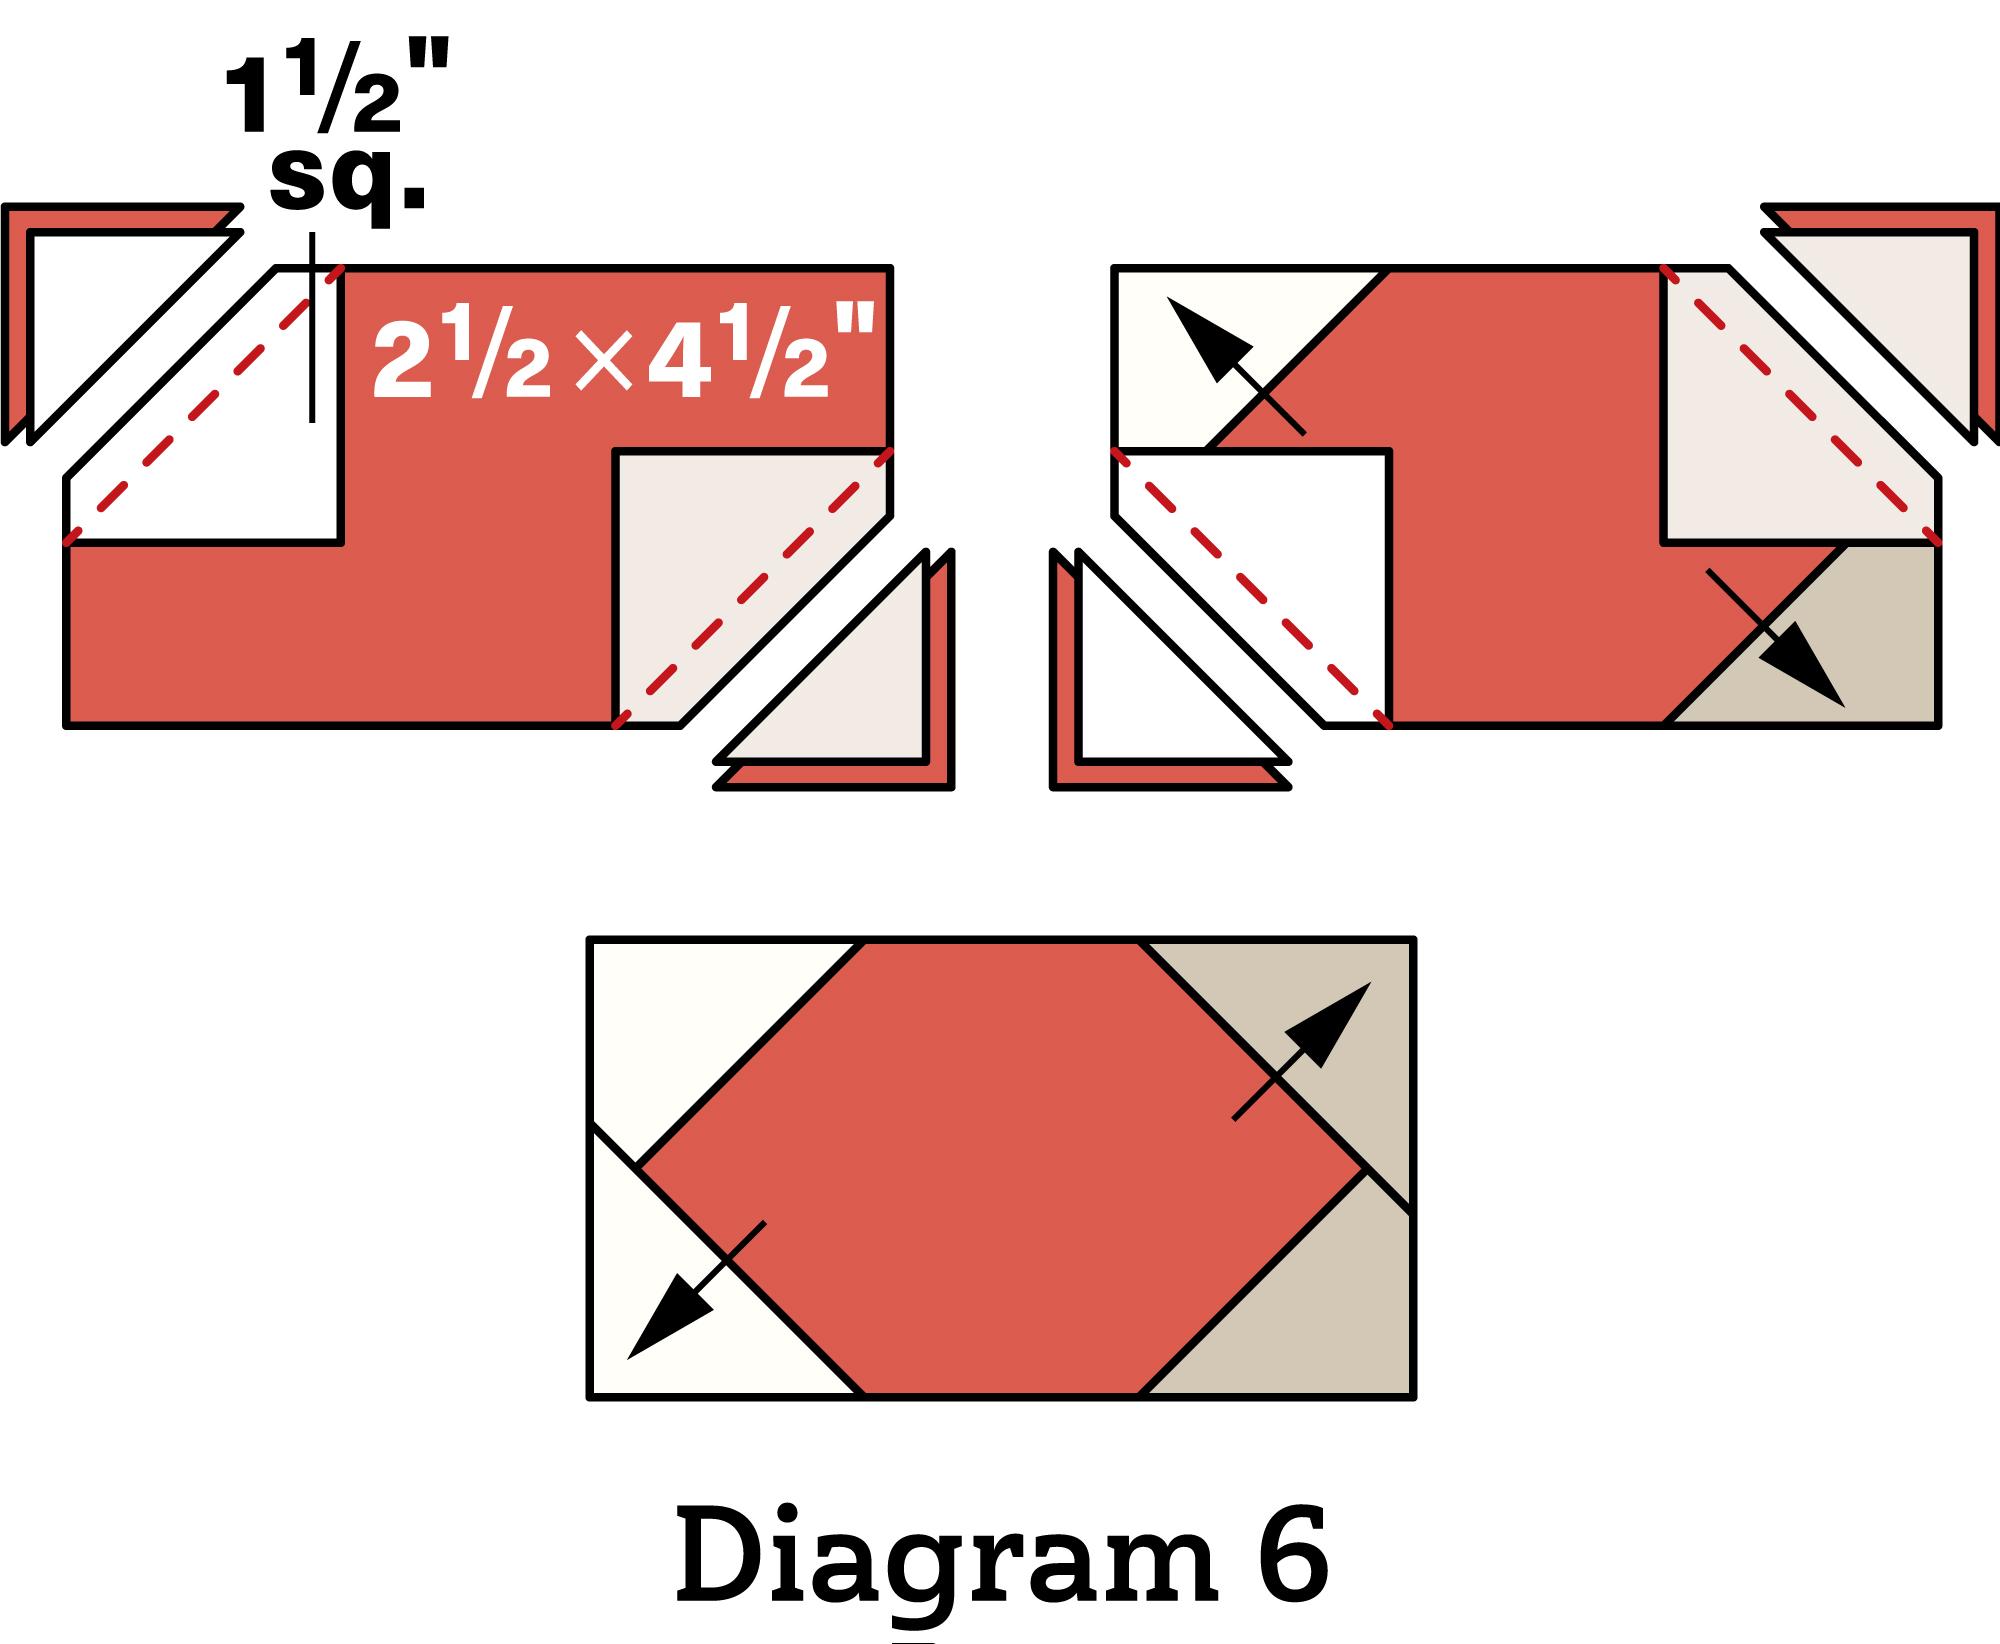 Good Tidings diagram 6